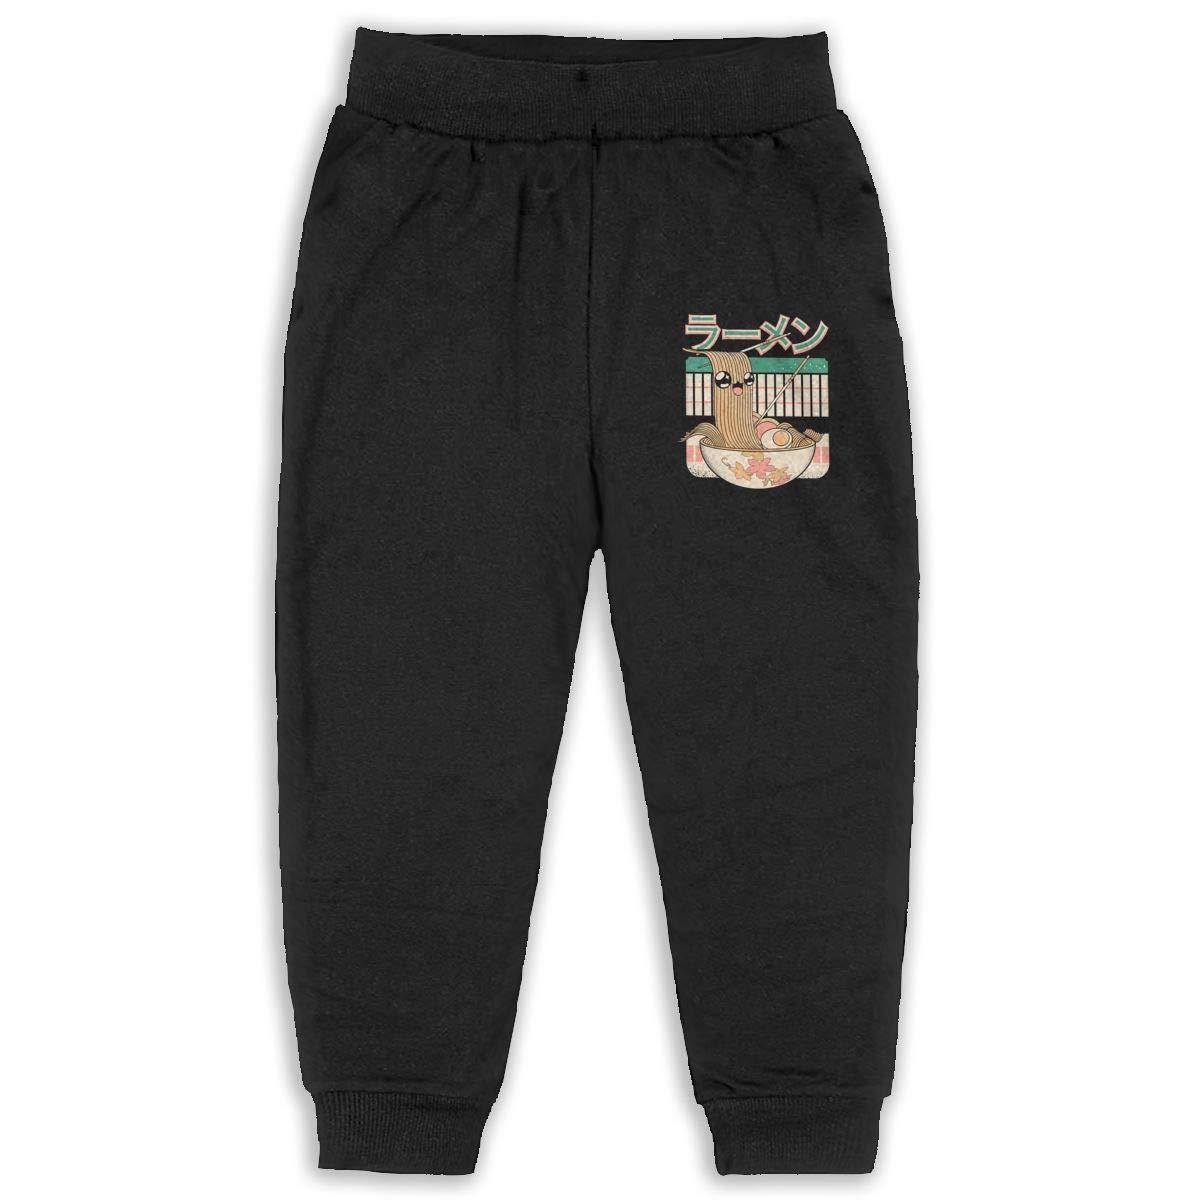 Laoyaotequ Kawaii Ramen Kids Cotton Sweatpants,Jogger Long Jersey Sweatpants